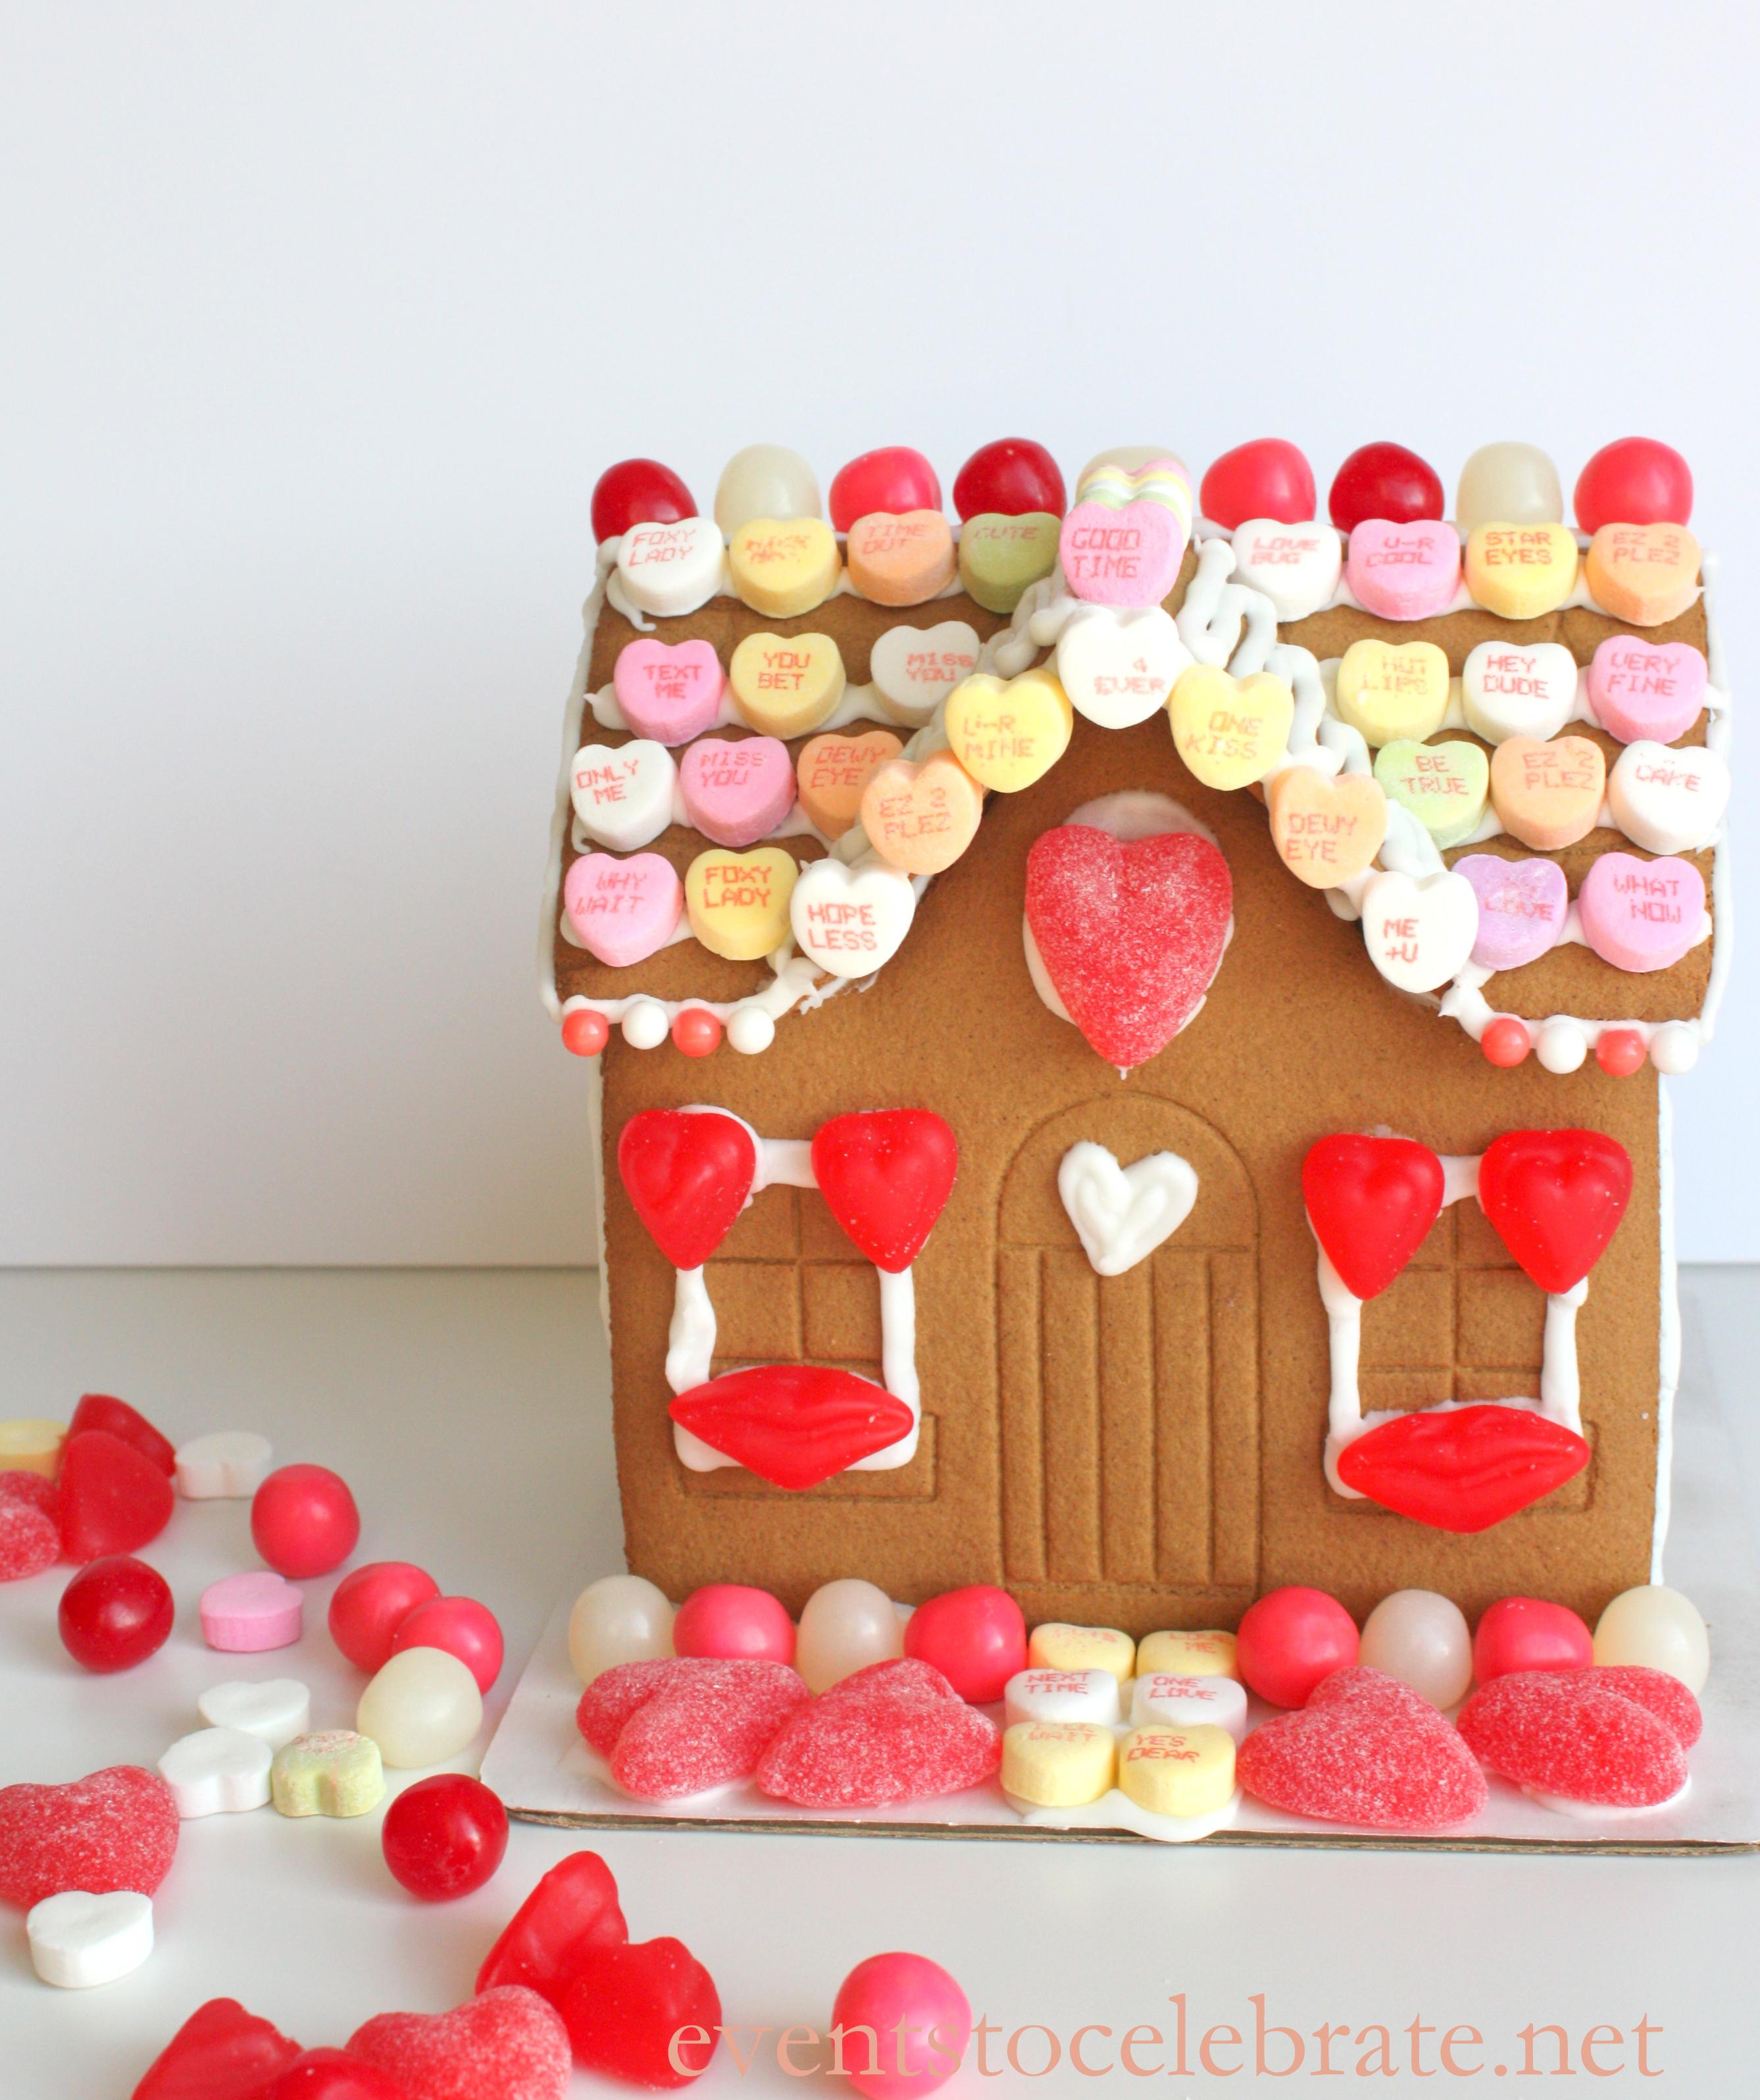 School valentines day ideas